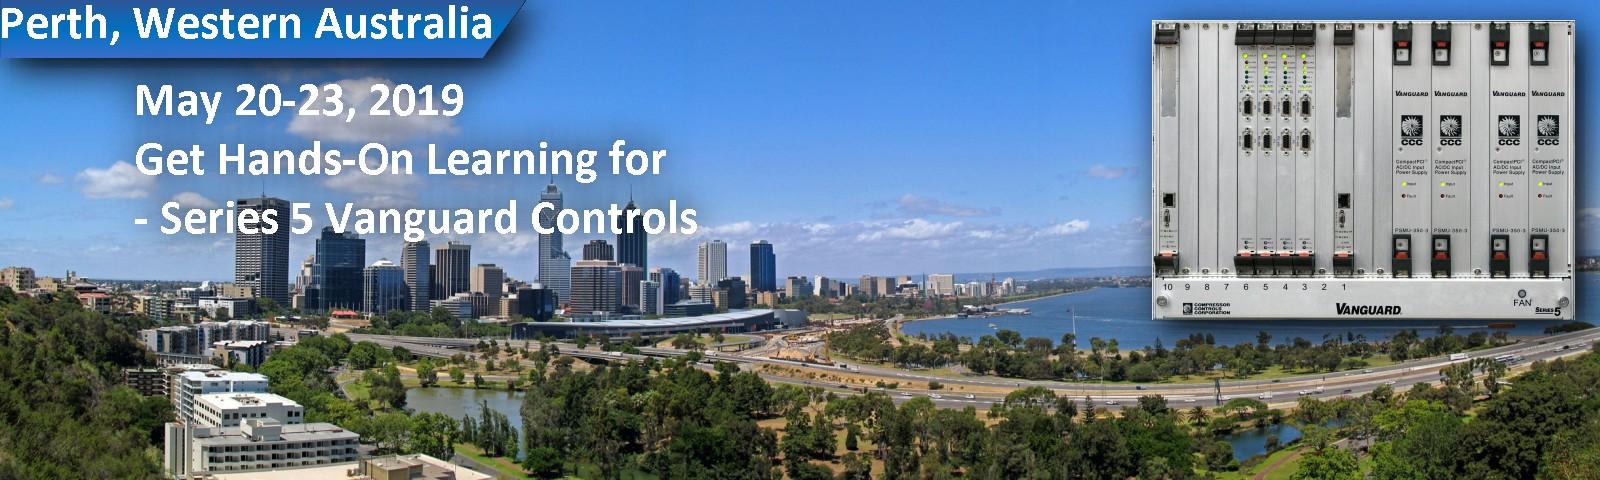 2018 Perth Series 5 Regional Training | <a  data-cke-saved-href='https://learning.cccglobal.com/ProductDetails.aspx?ProductID=266' href='http://learning.cccglobal.com/ProductDetails.aspx?ProductID=266'>Register Now</a>